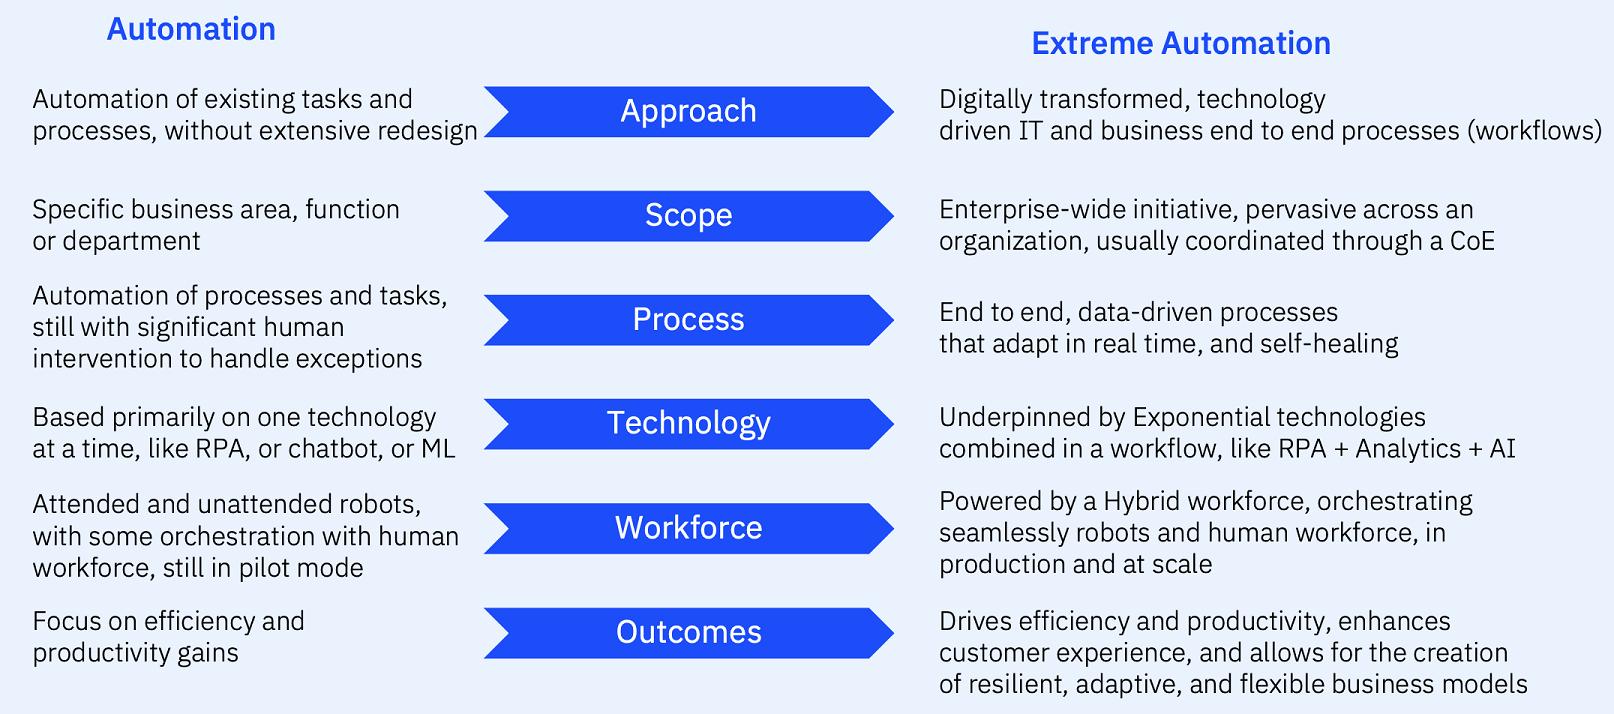 Automation versus Extreme Automation